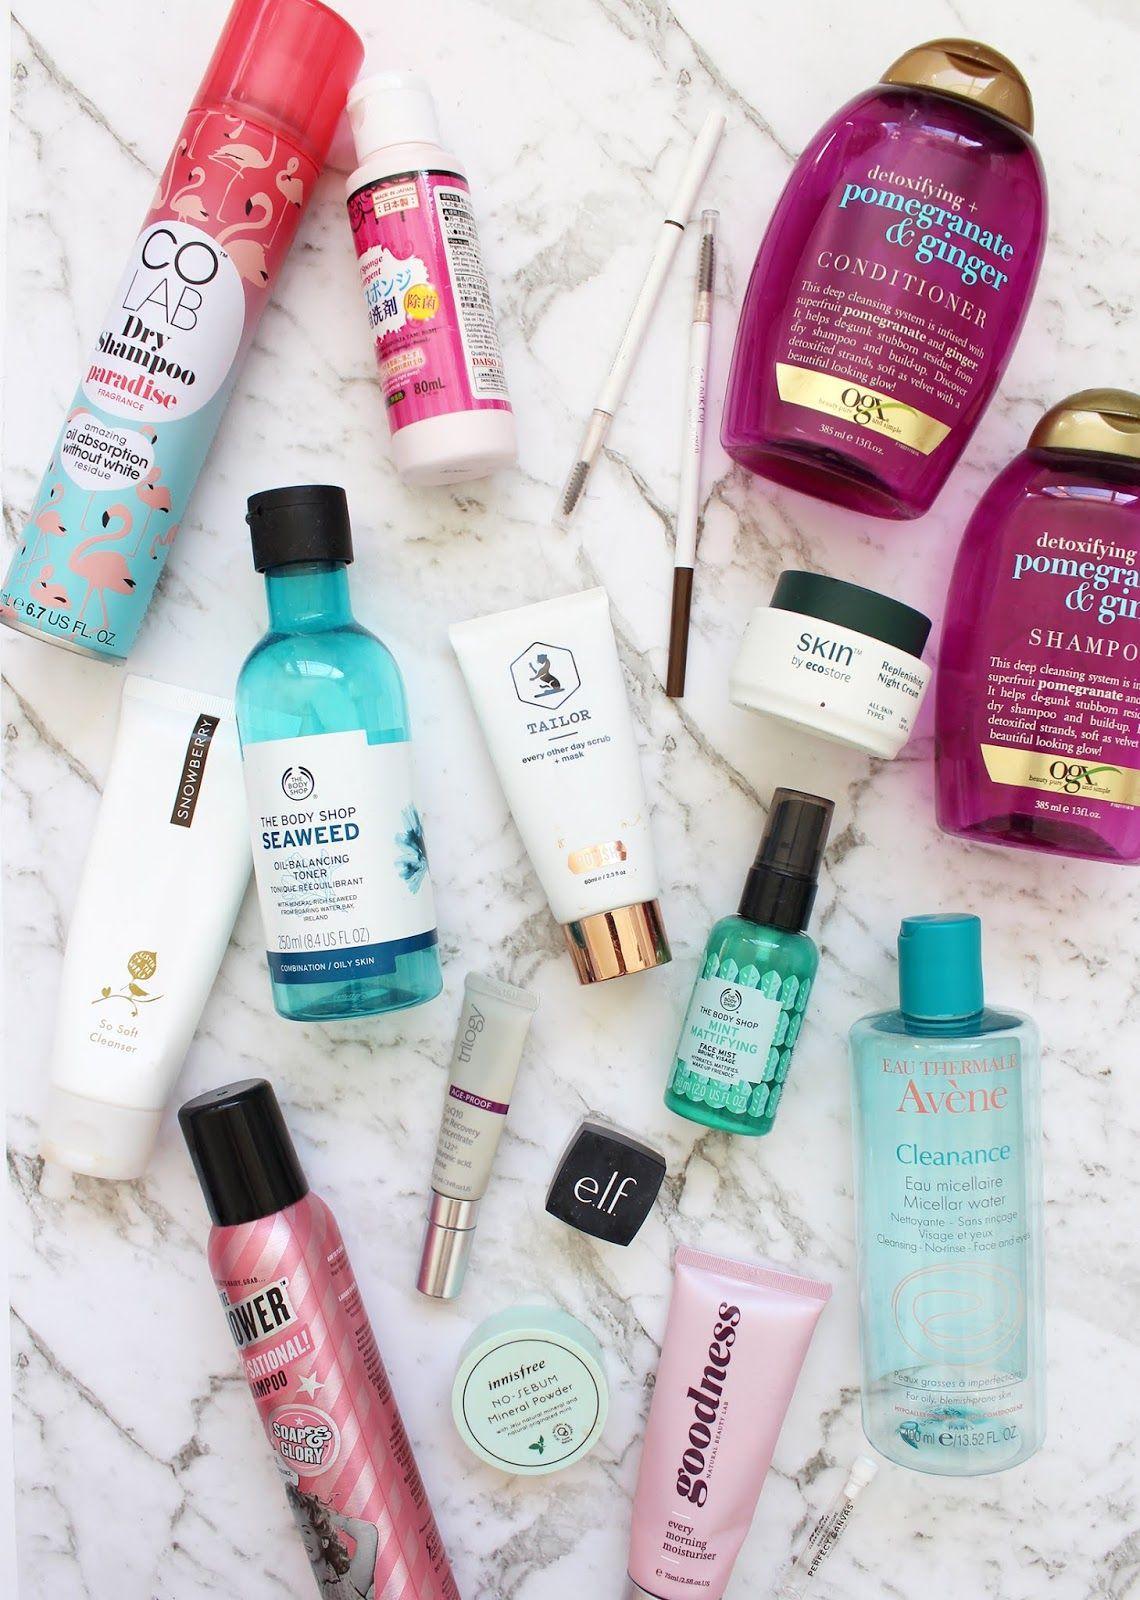 RECENT EMPTIES Good dry shampoo, Dry shampoo, The body shop